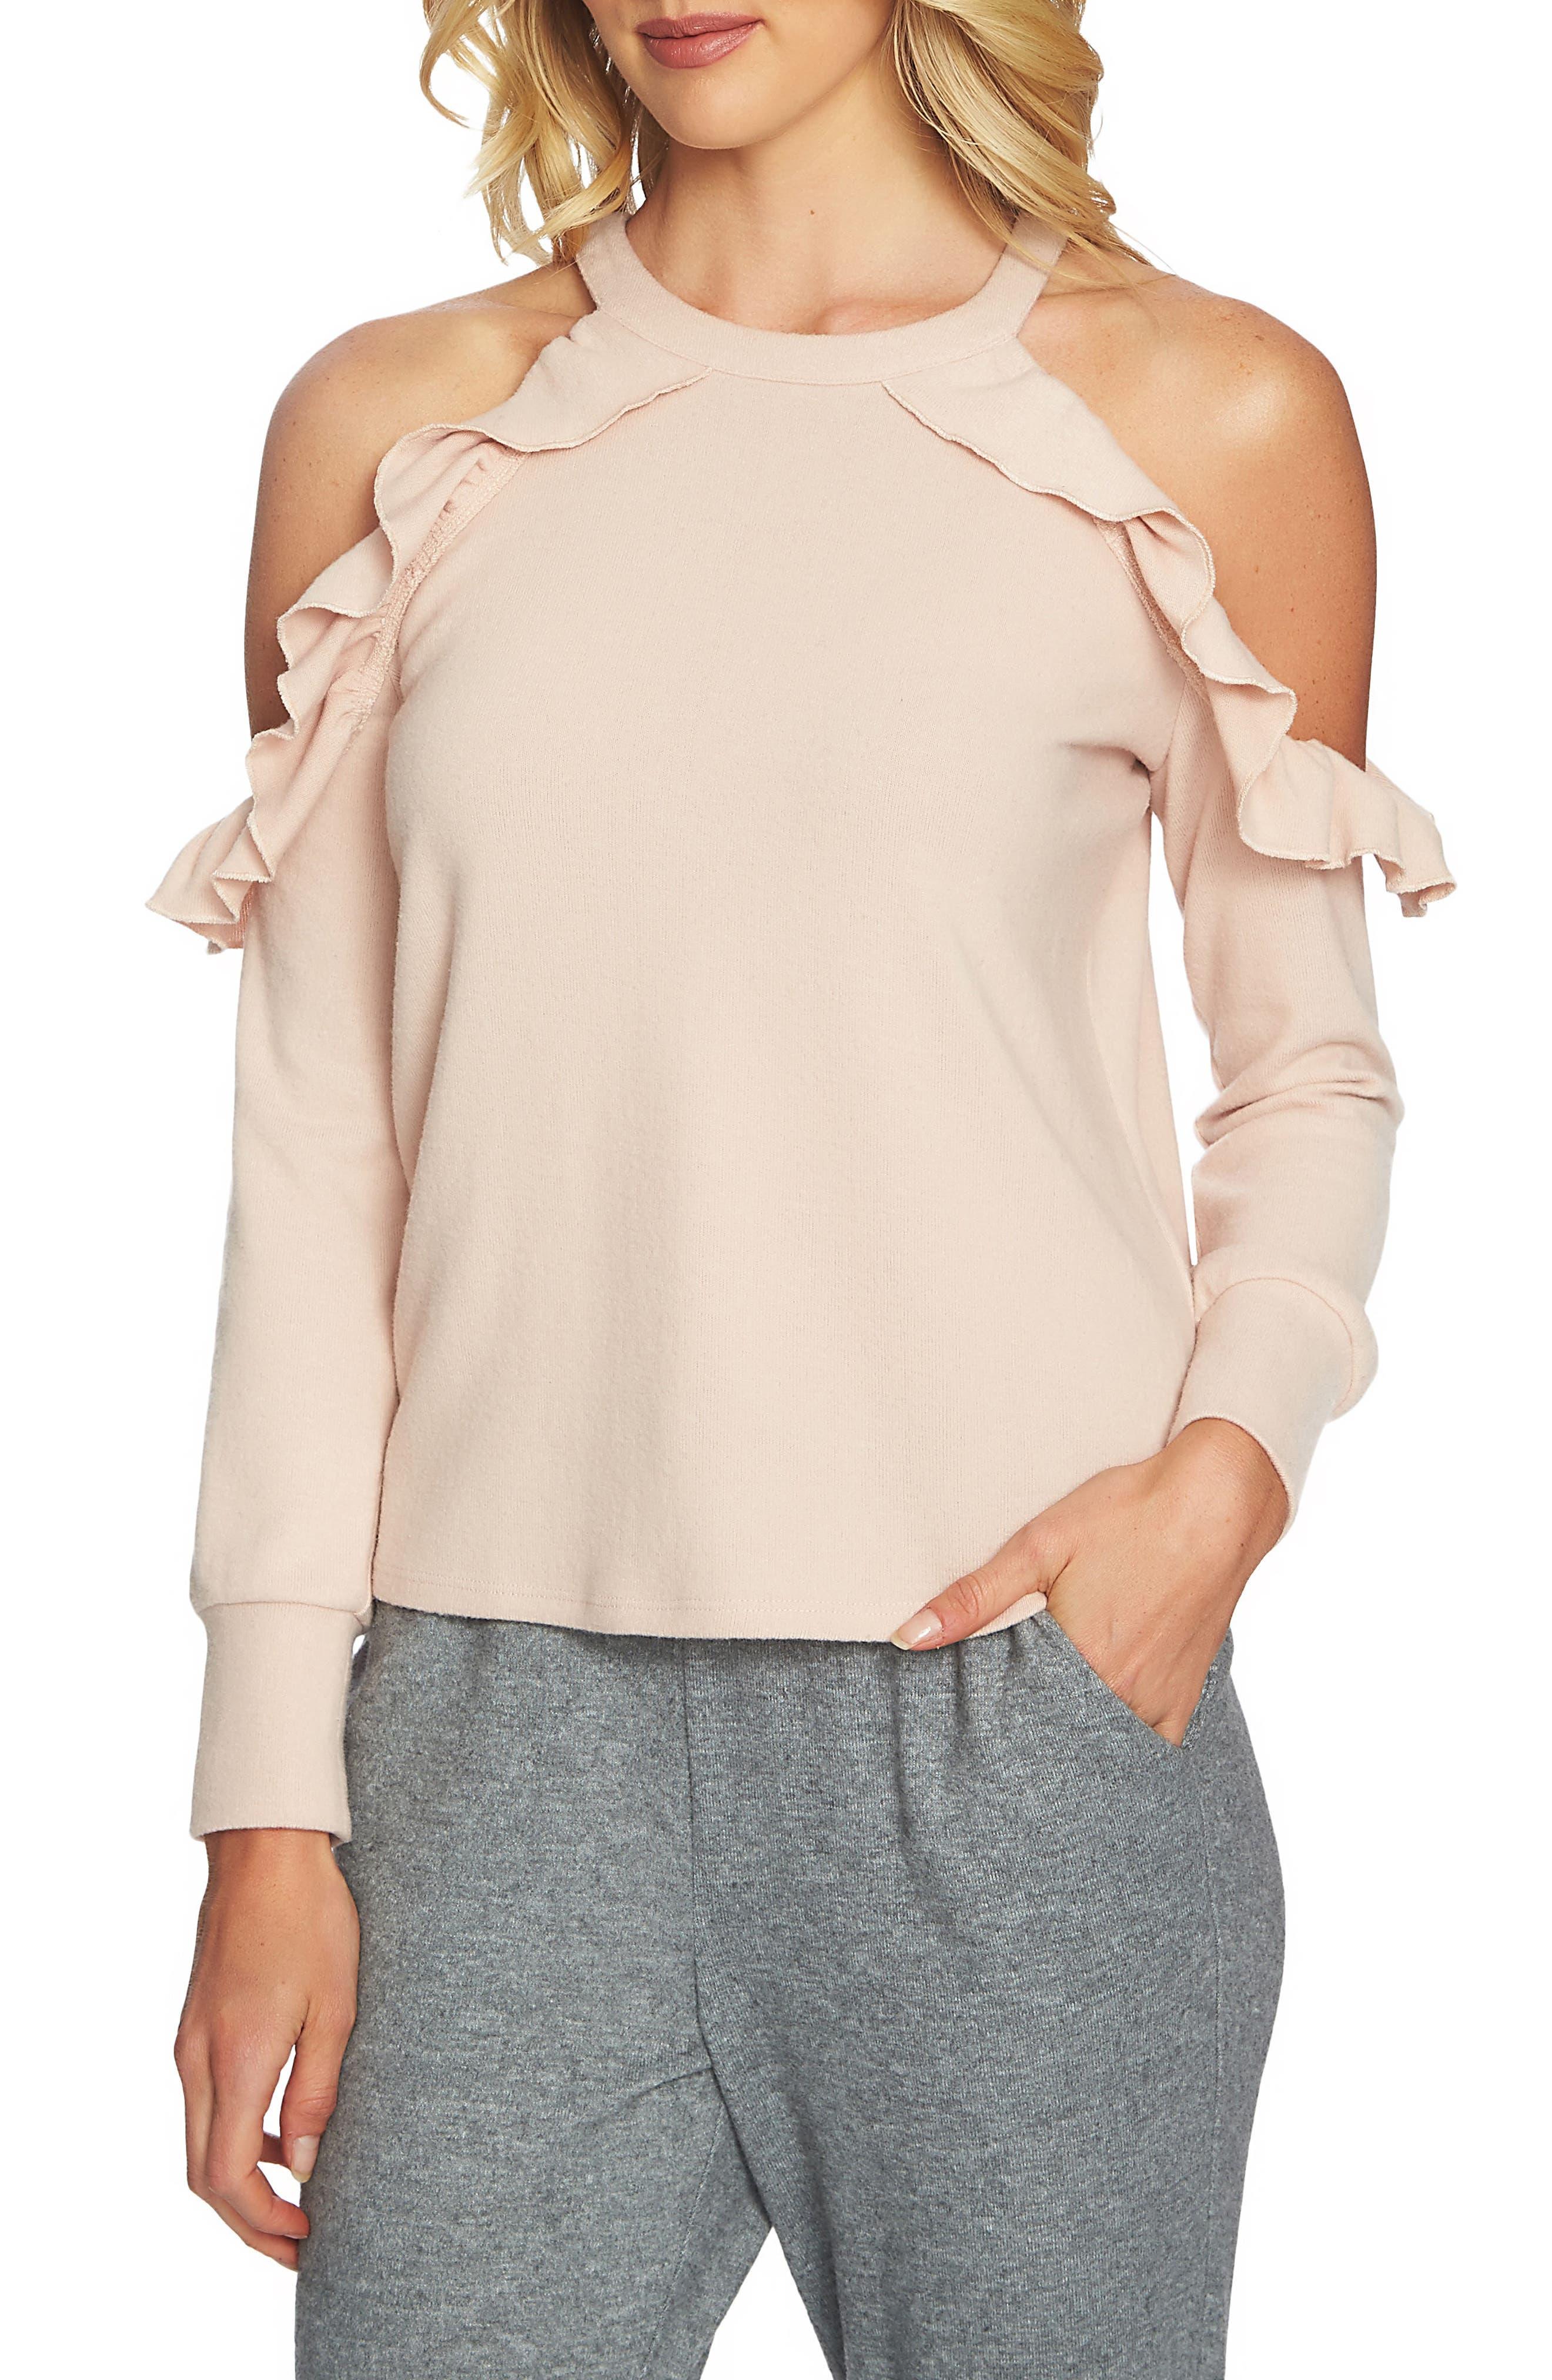 The Cozy Cold Shoulder Knit Top,                             Main thumbnail 1, color,                             897-Blush Frost